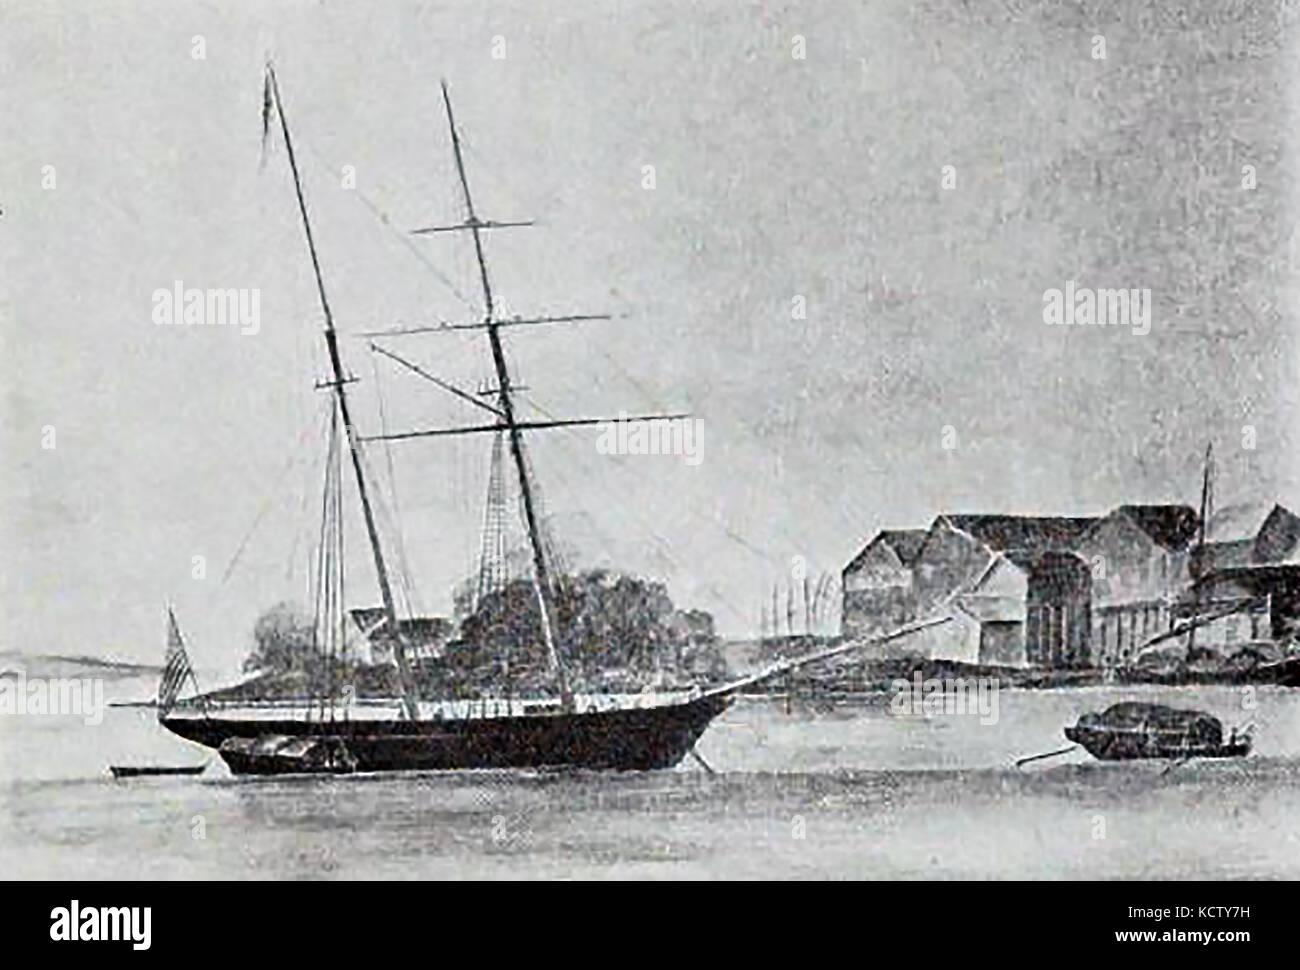 The Boston (USA) Schooner BRENDA, built at Portsmouth New Hampshire in 1852 - Stock Image